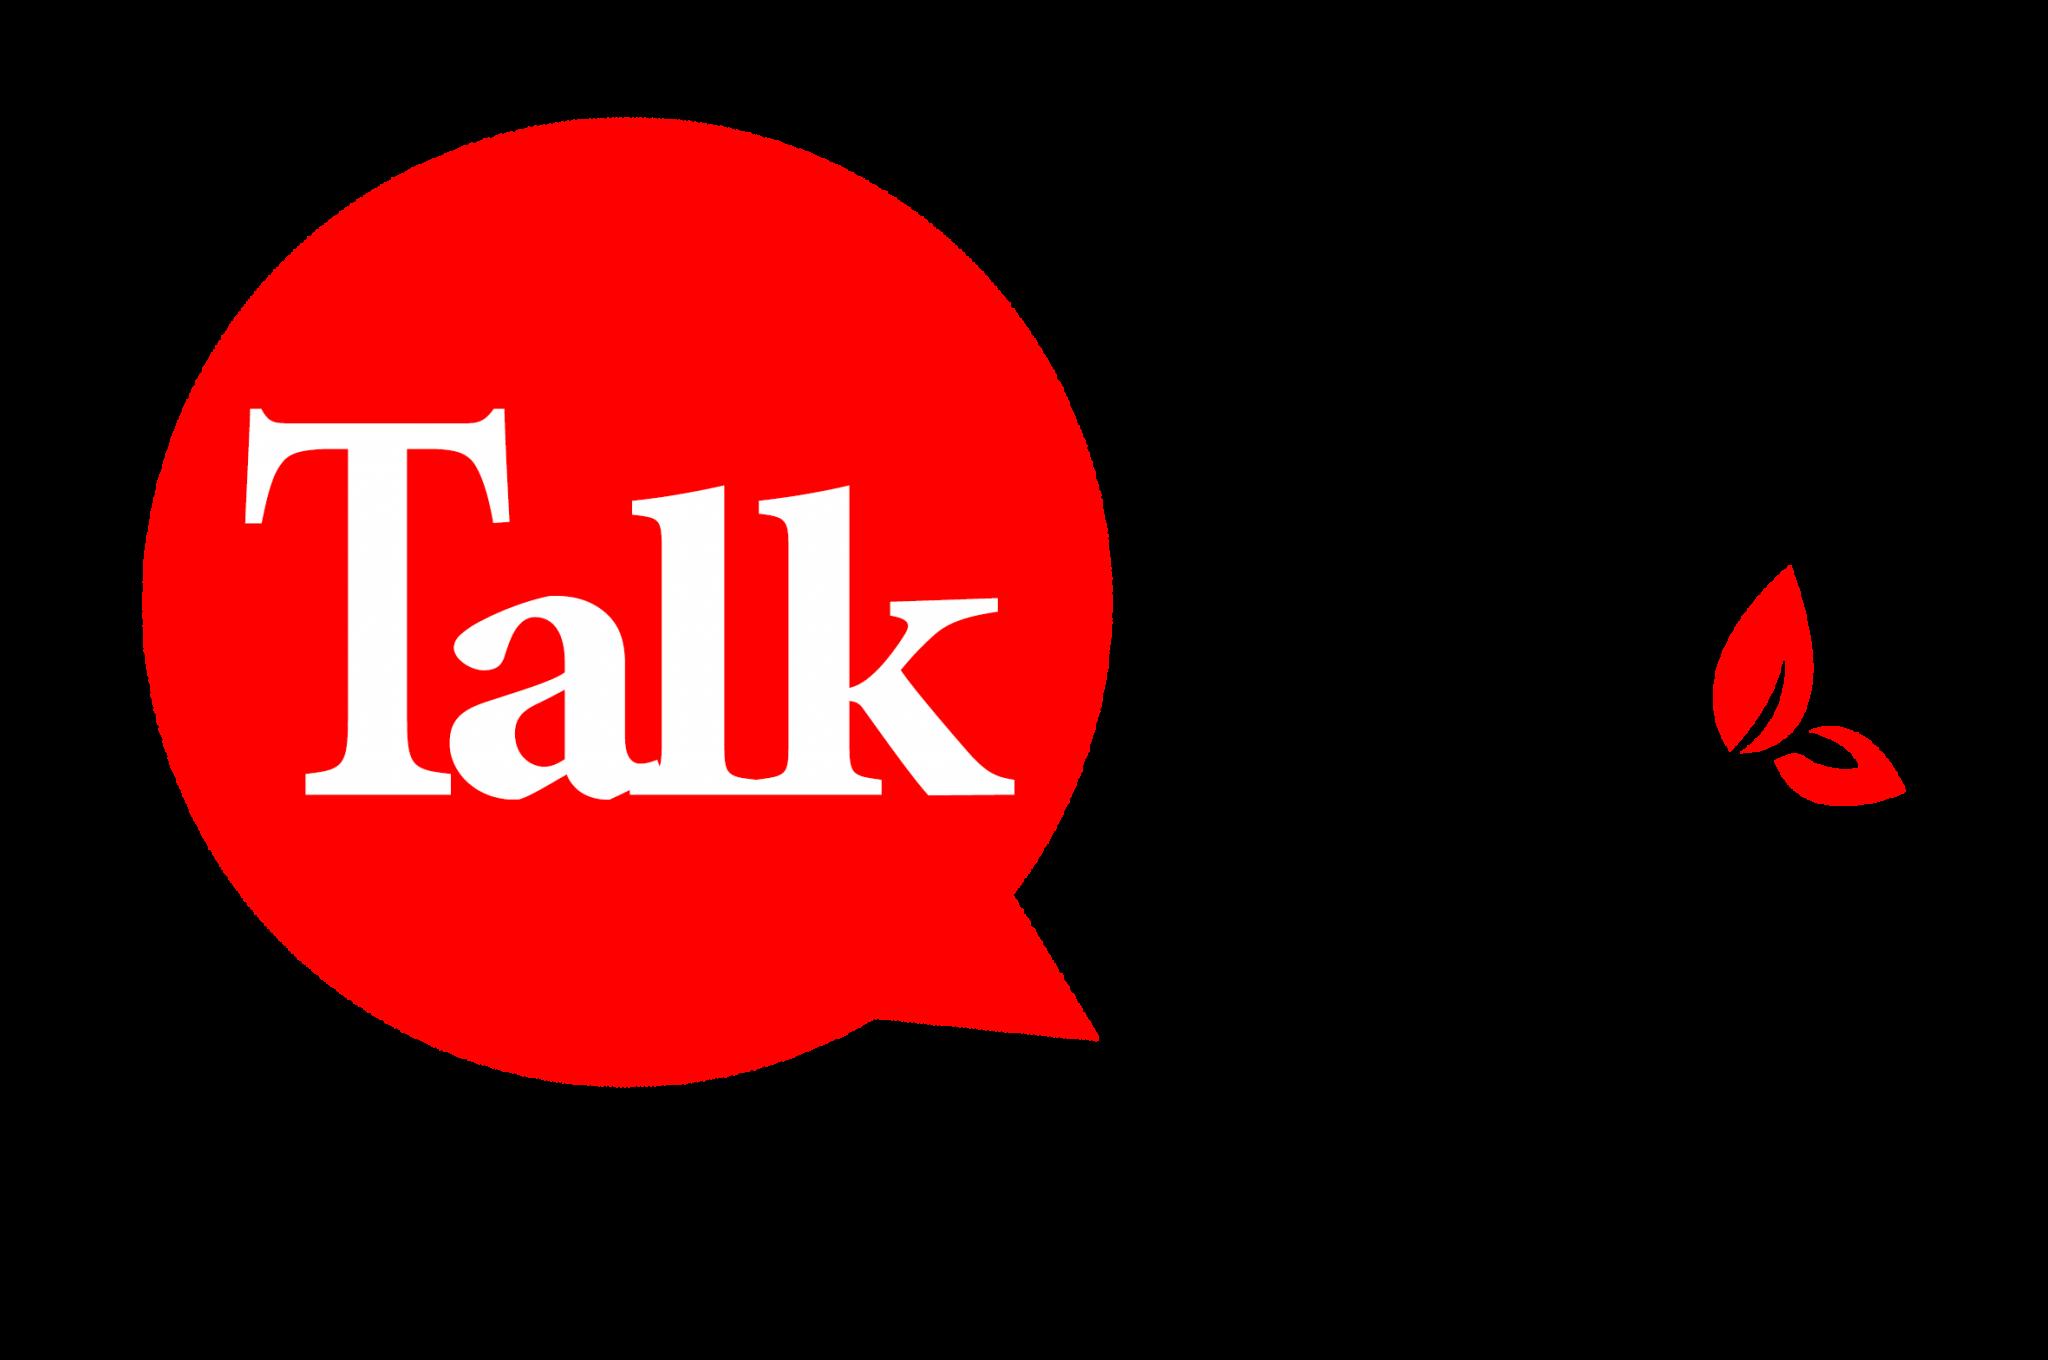 TalkAg